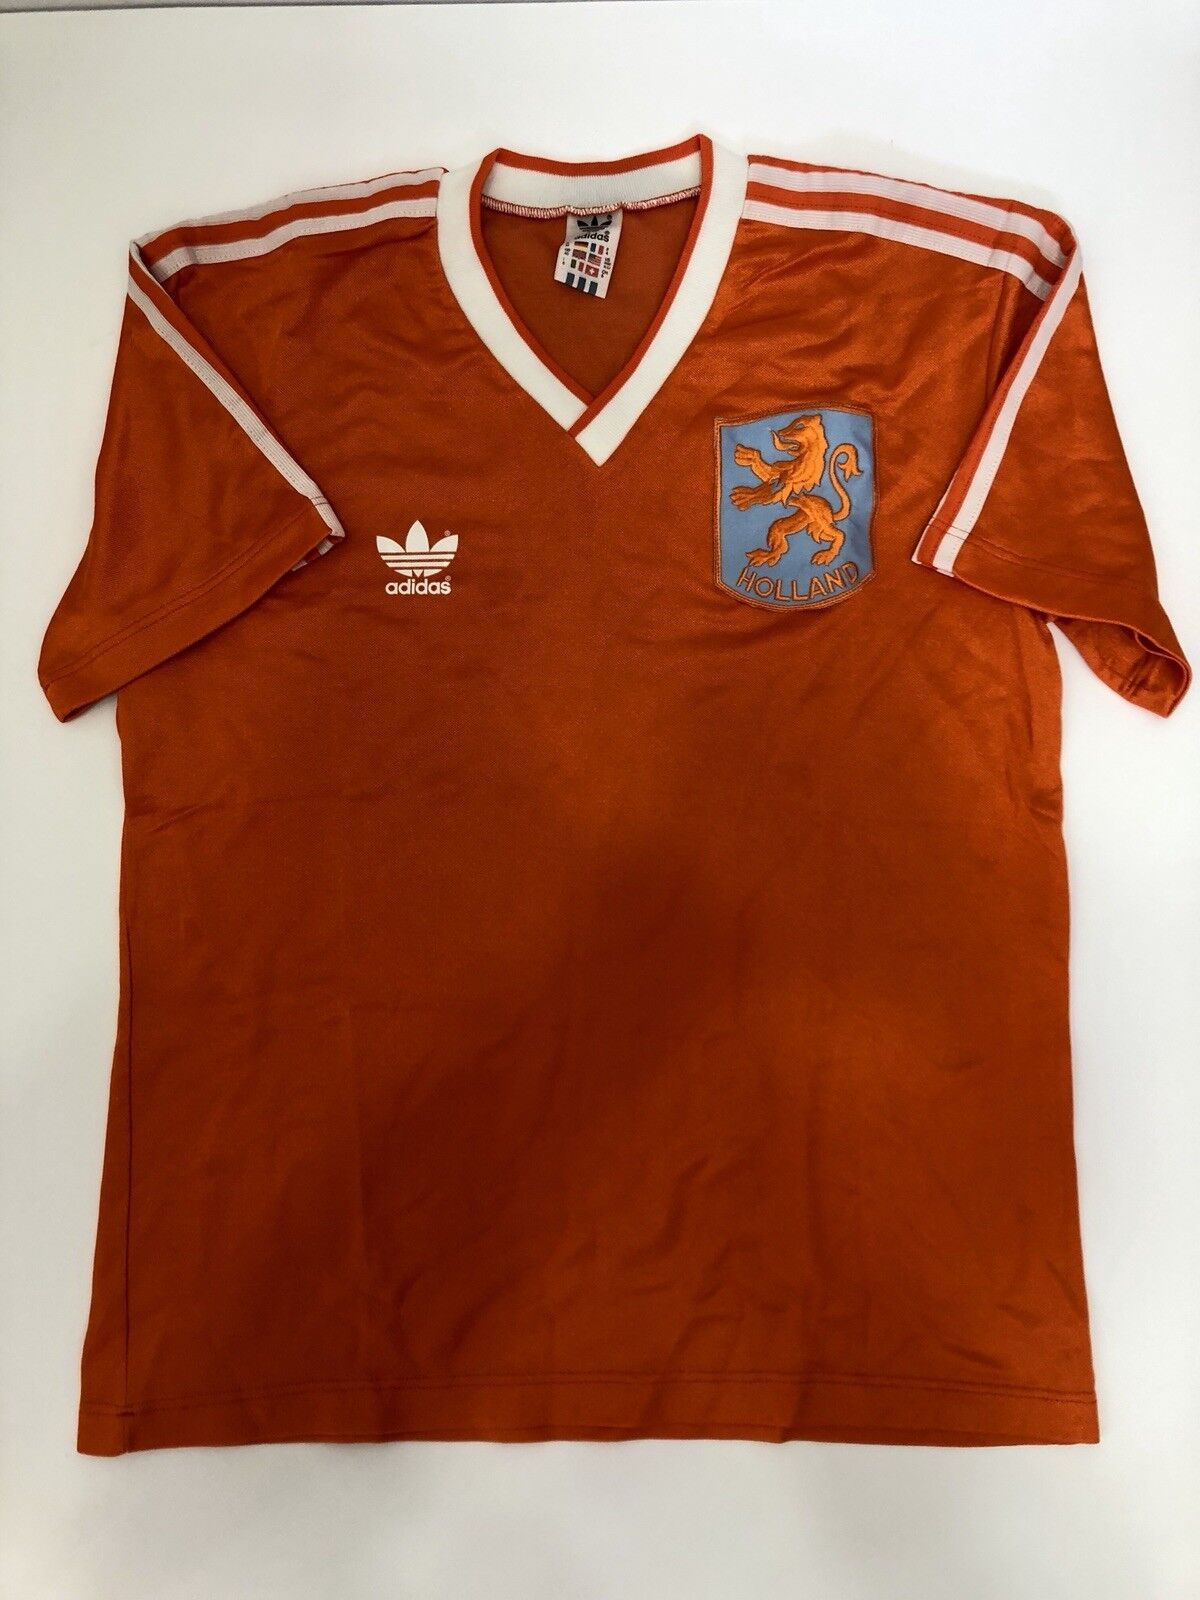 Adidas Vintage Olea Holle Nazionale Oleese Maglia Calcio Taglia M Anni 70